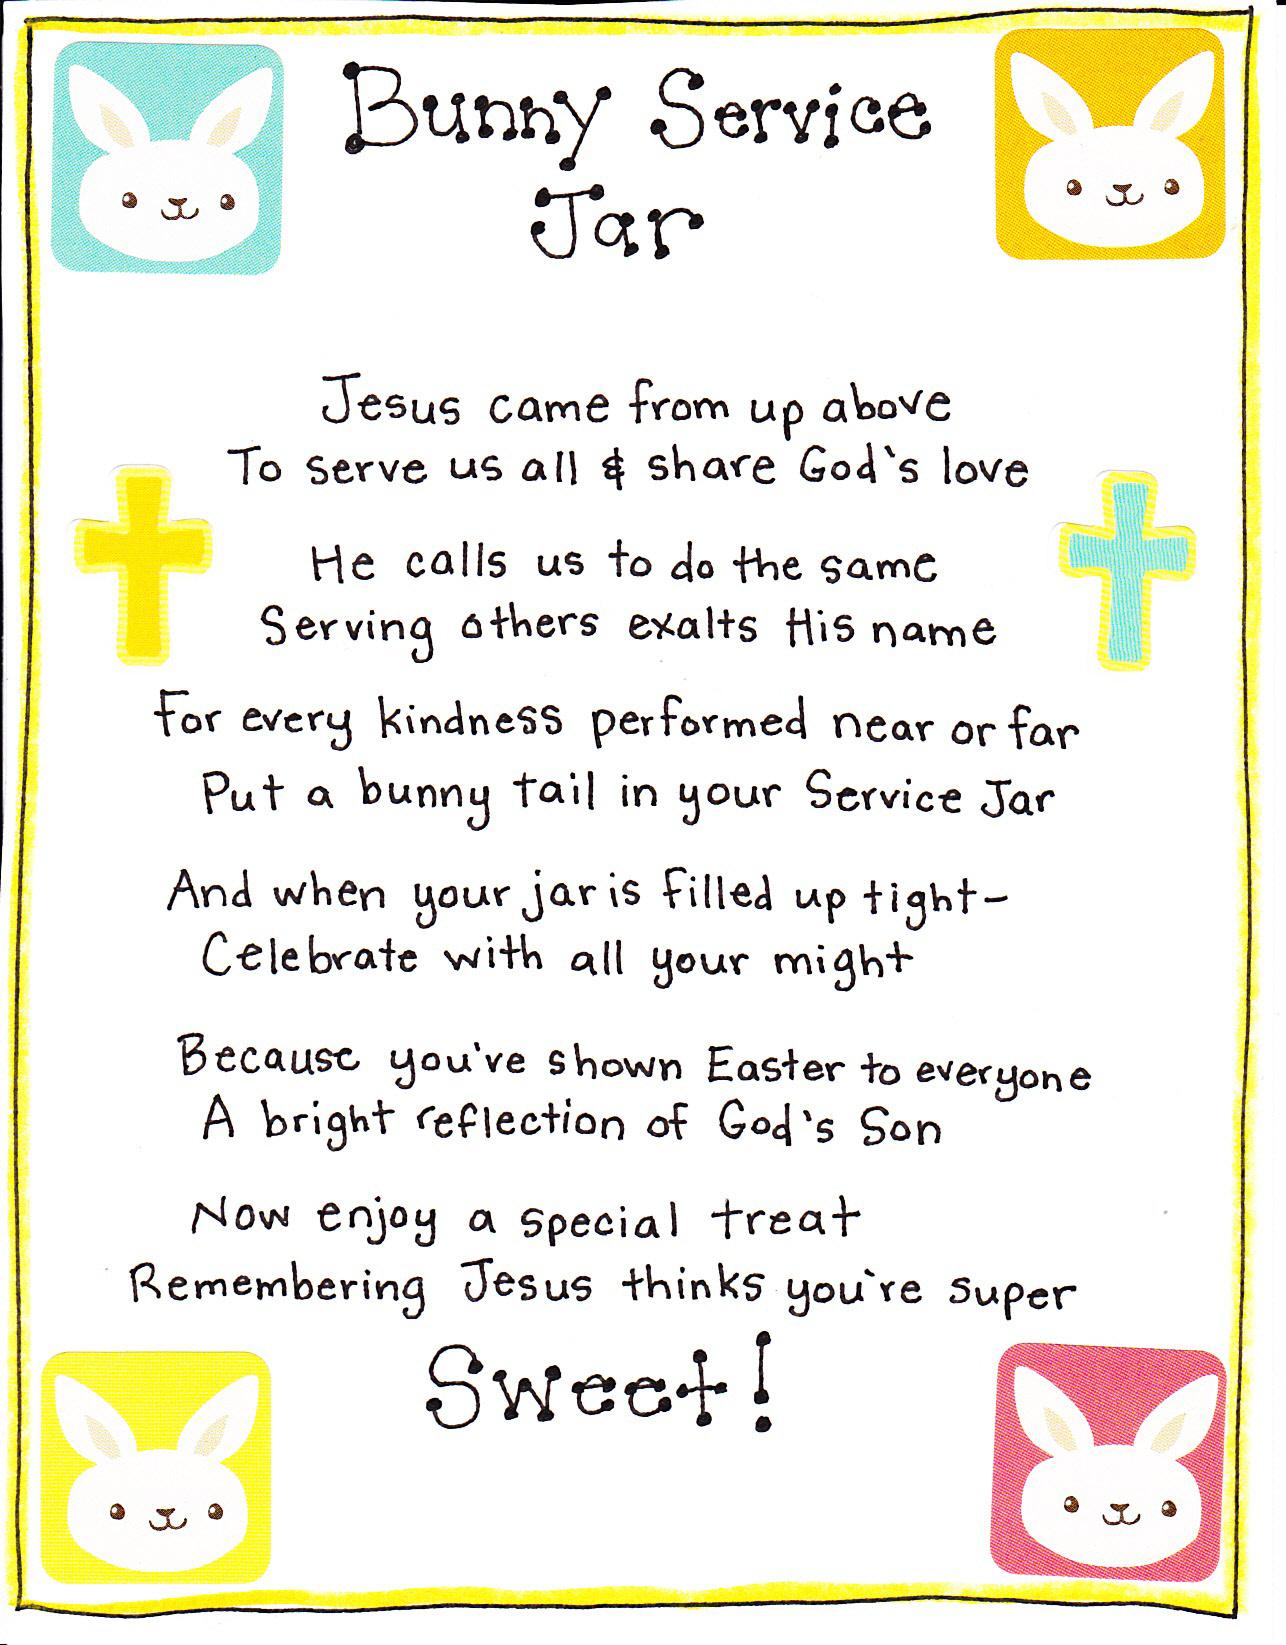 Bunny Service Jar